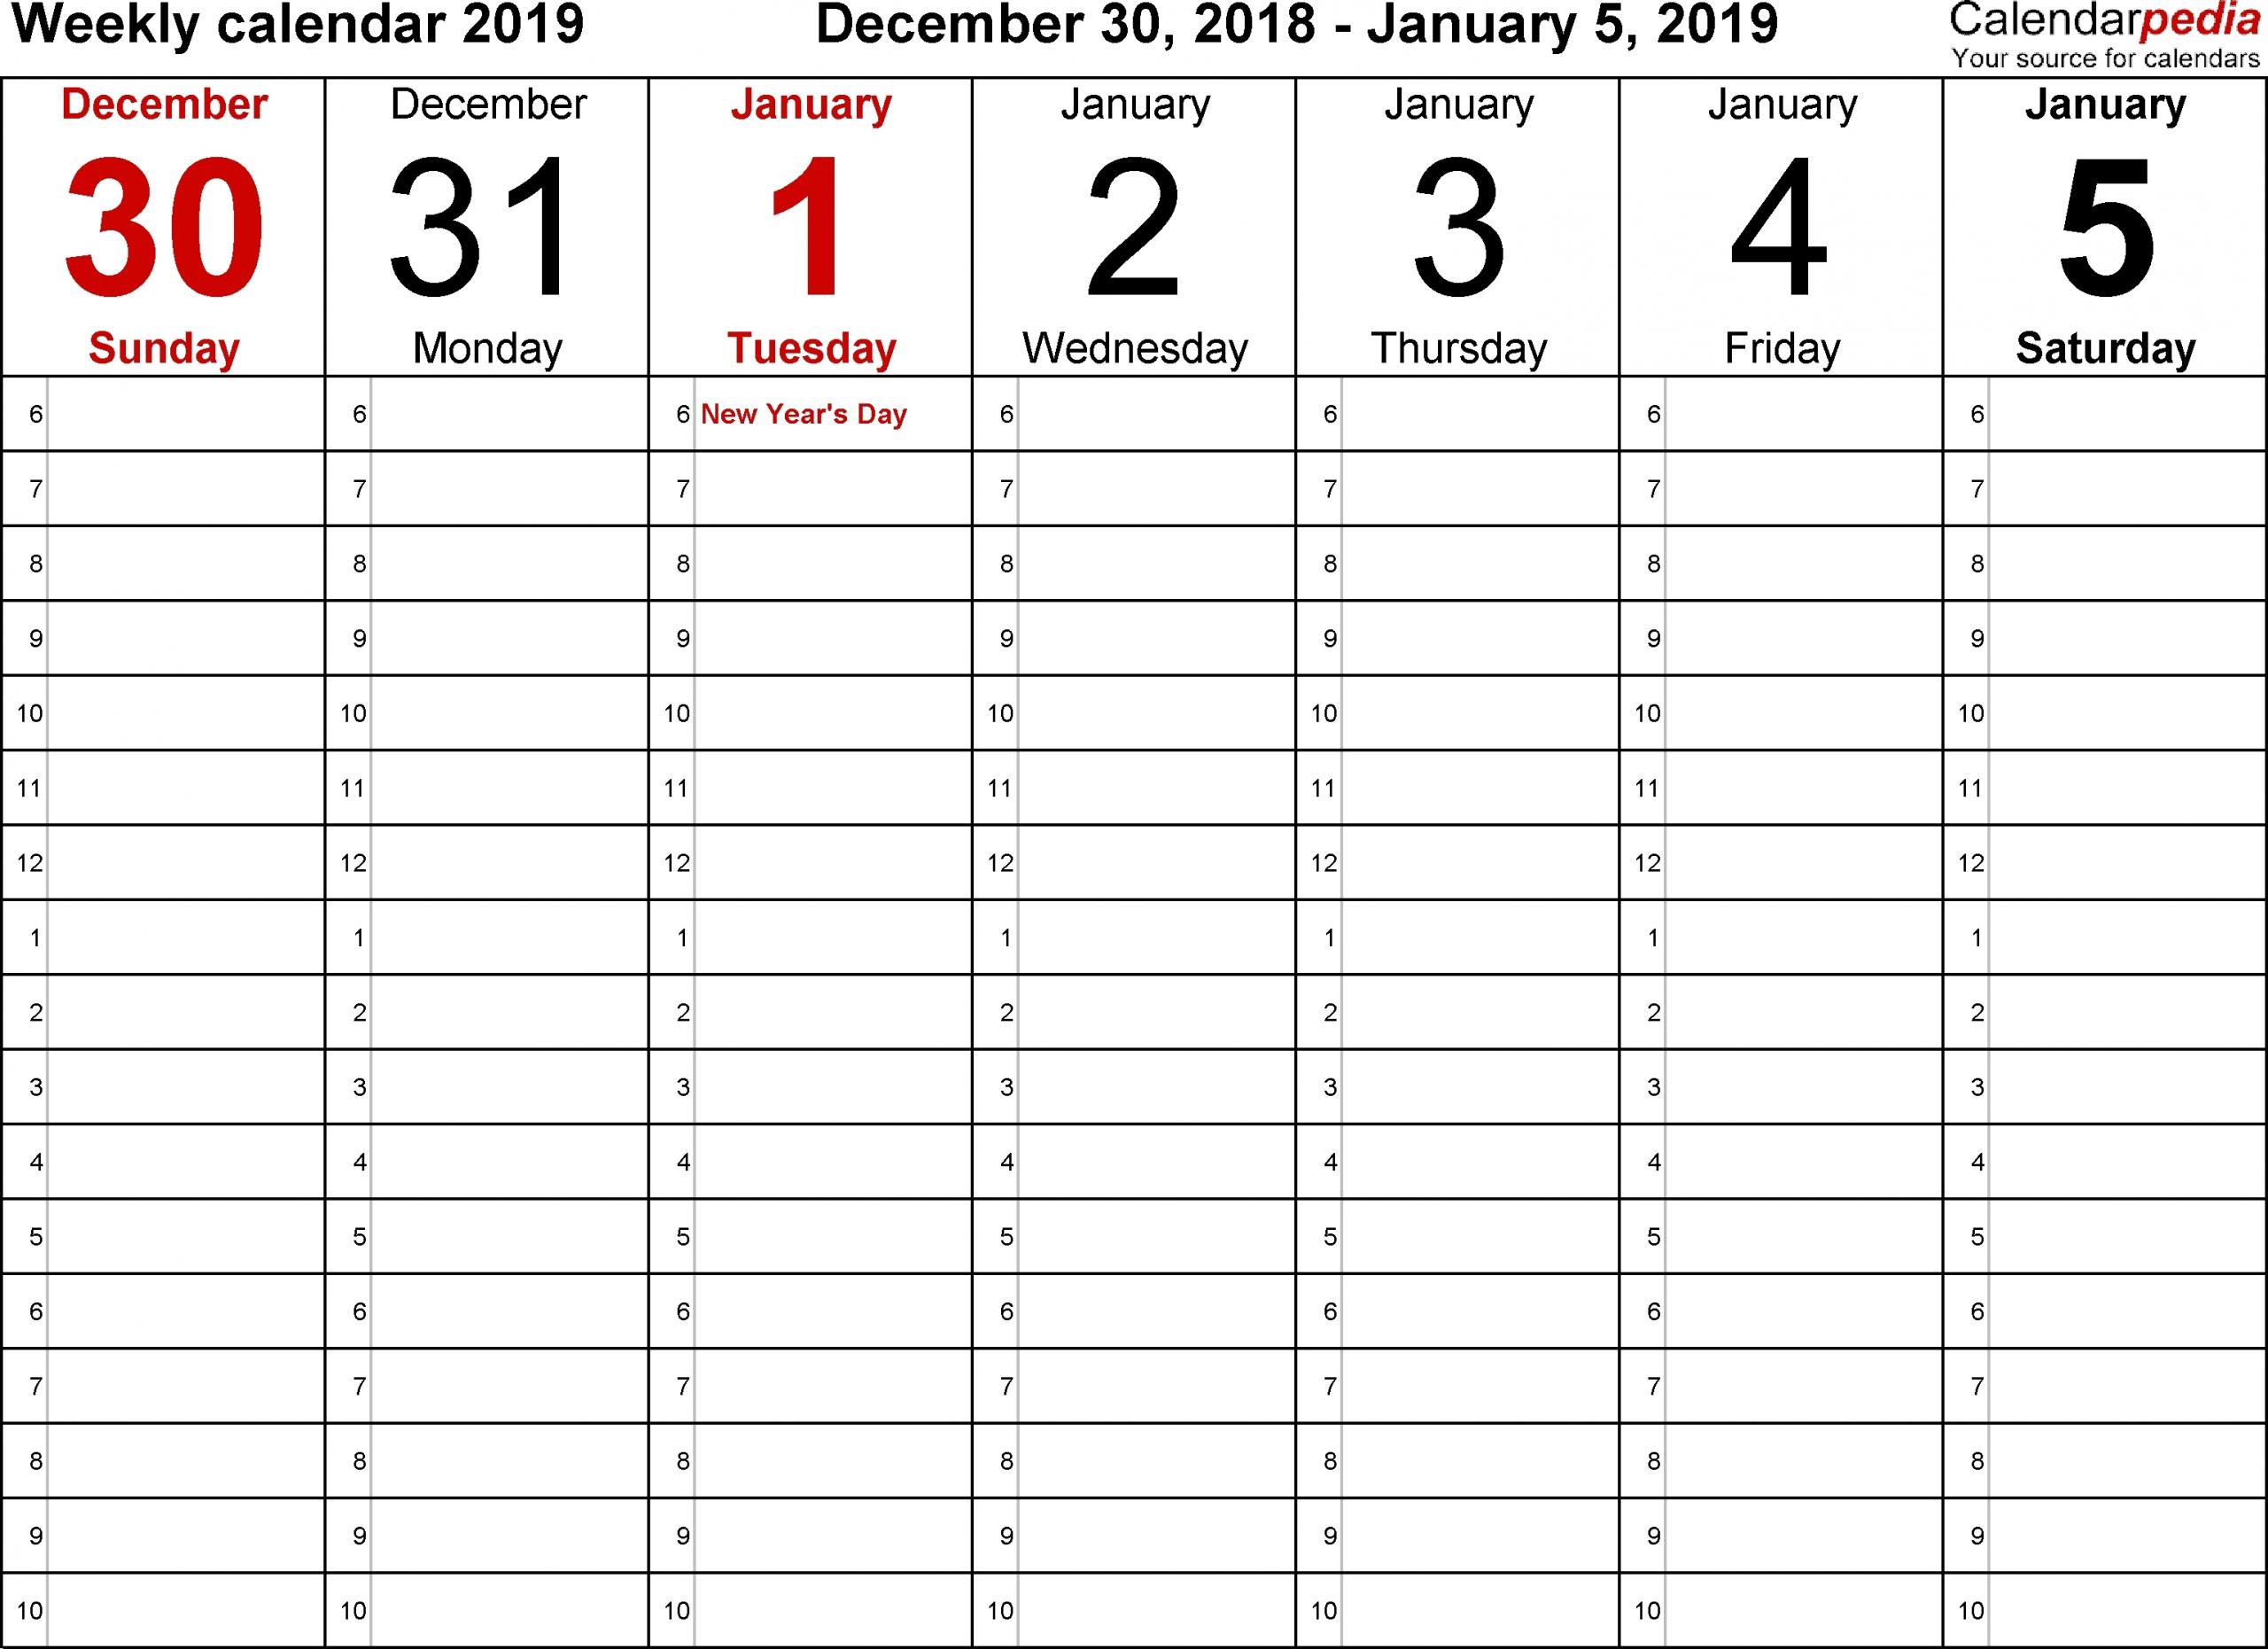 Free Printable Blank Calendar August-December | Calendar